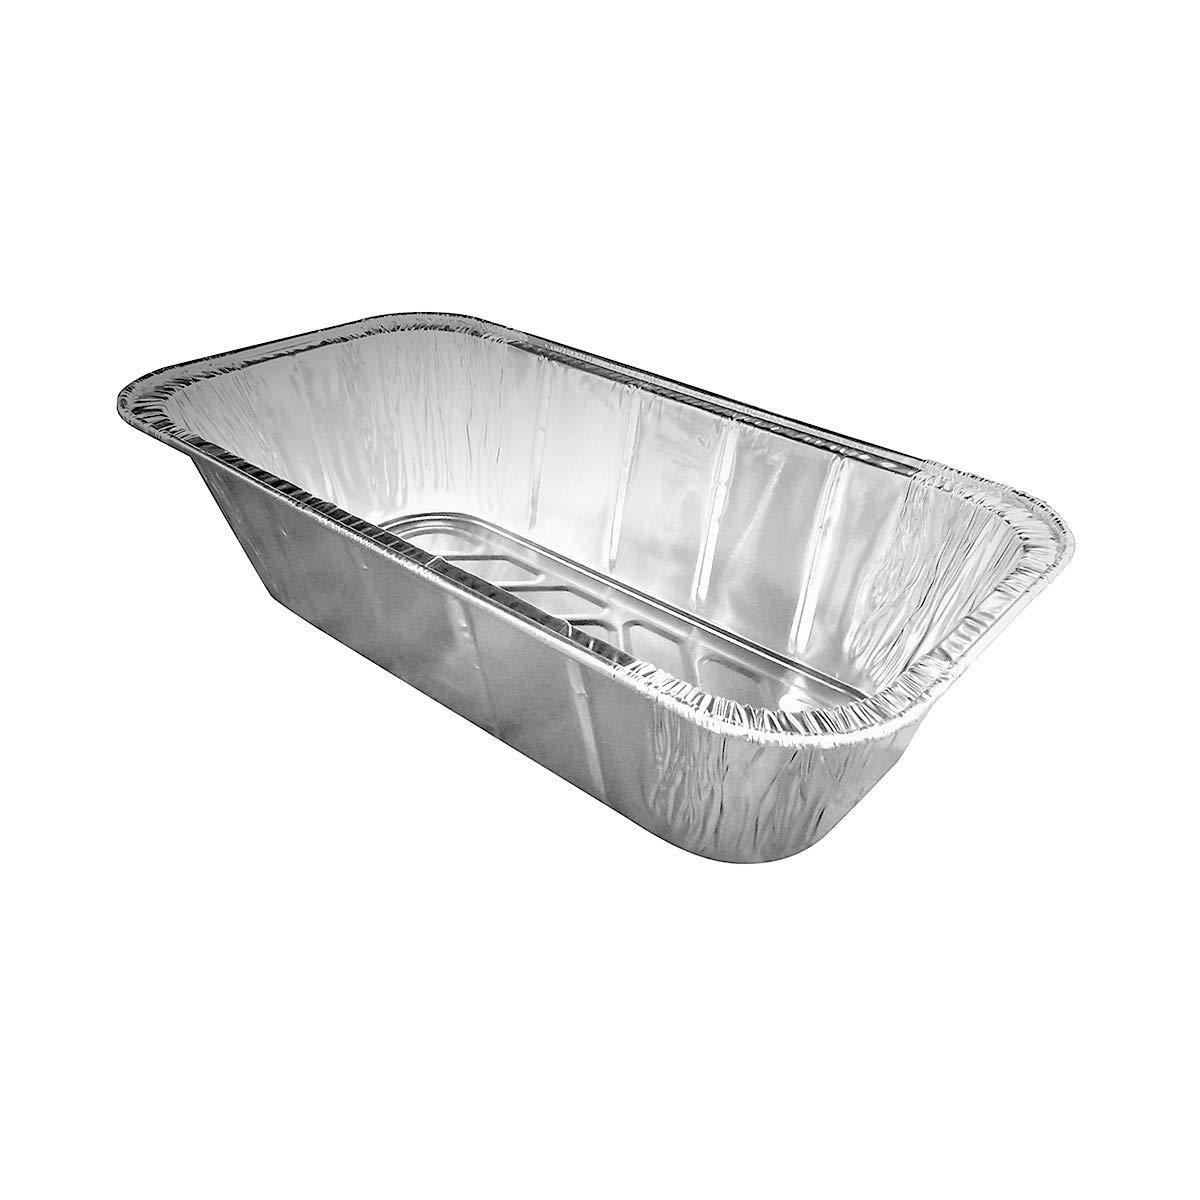 KitchenDance Disposable Aluminum Loaf Pans (50, 5 Pound Loaf)